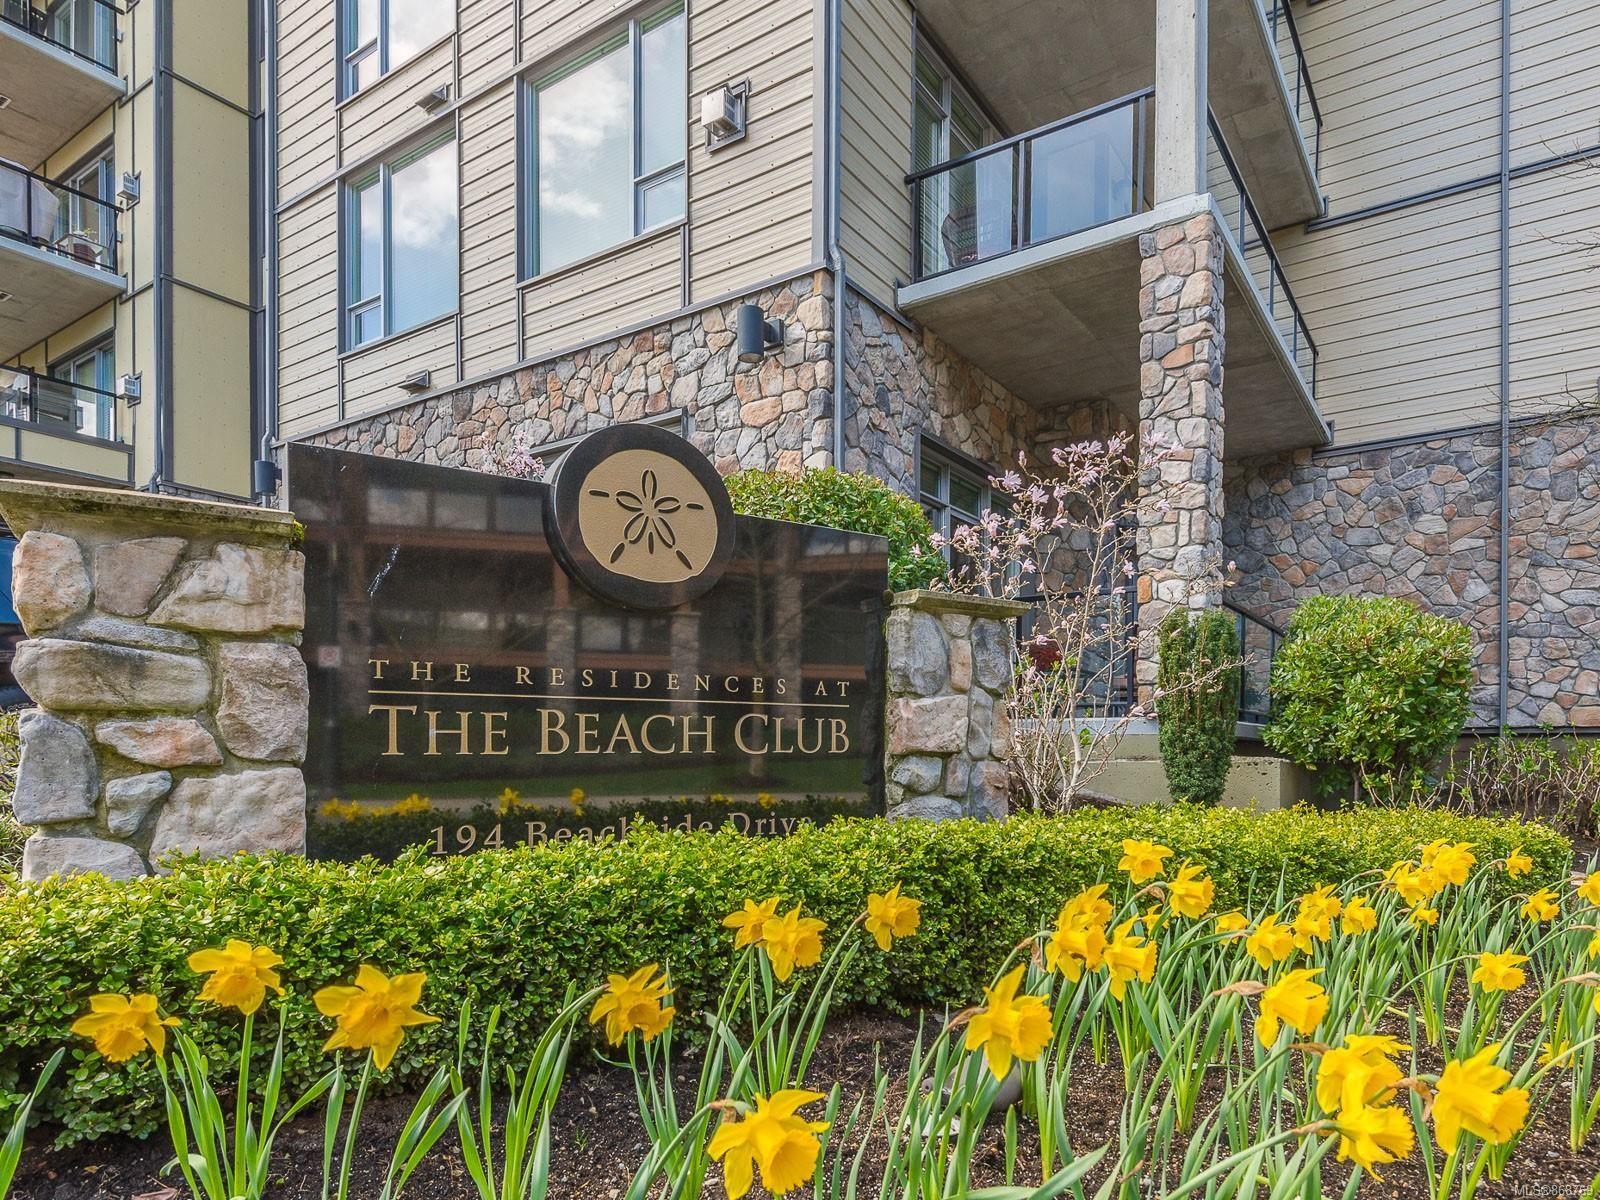 Main Photo: 420B 181 Beachside Dr in : PQ Parksville Condo for sale (Parksville/Qualicum)  : MLS®# 868769